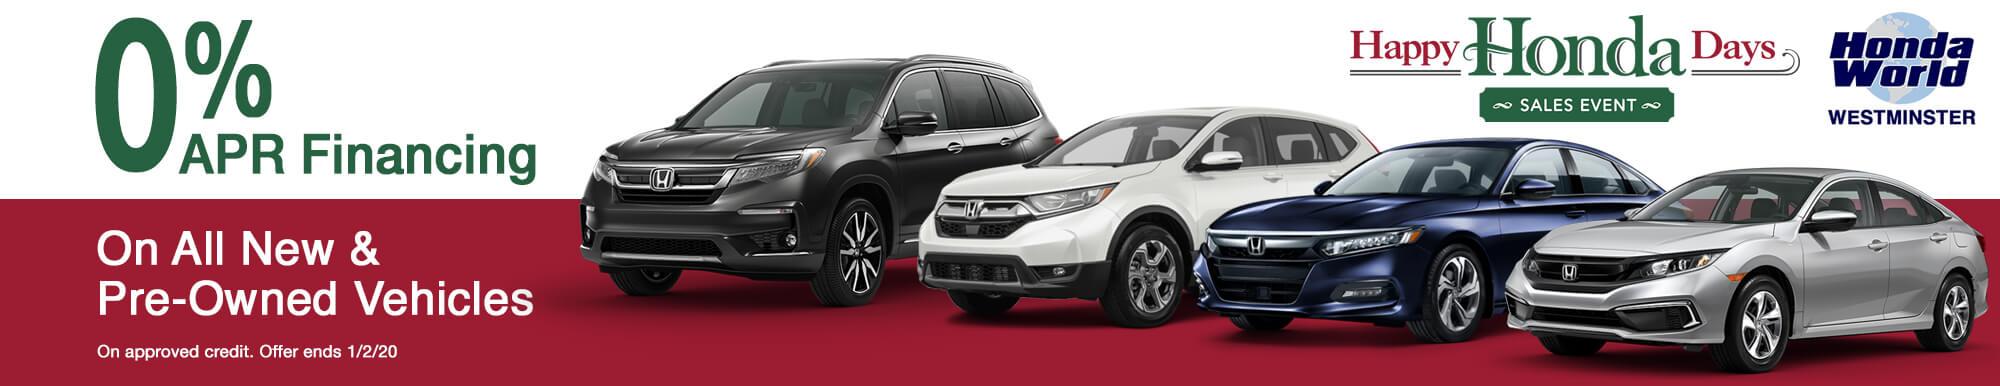 Happy Honda Days Sales Event at Honda World Westmintser